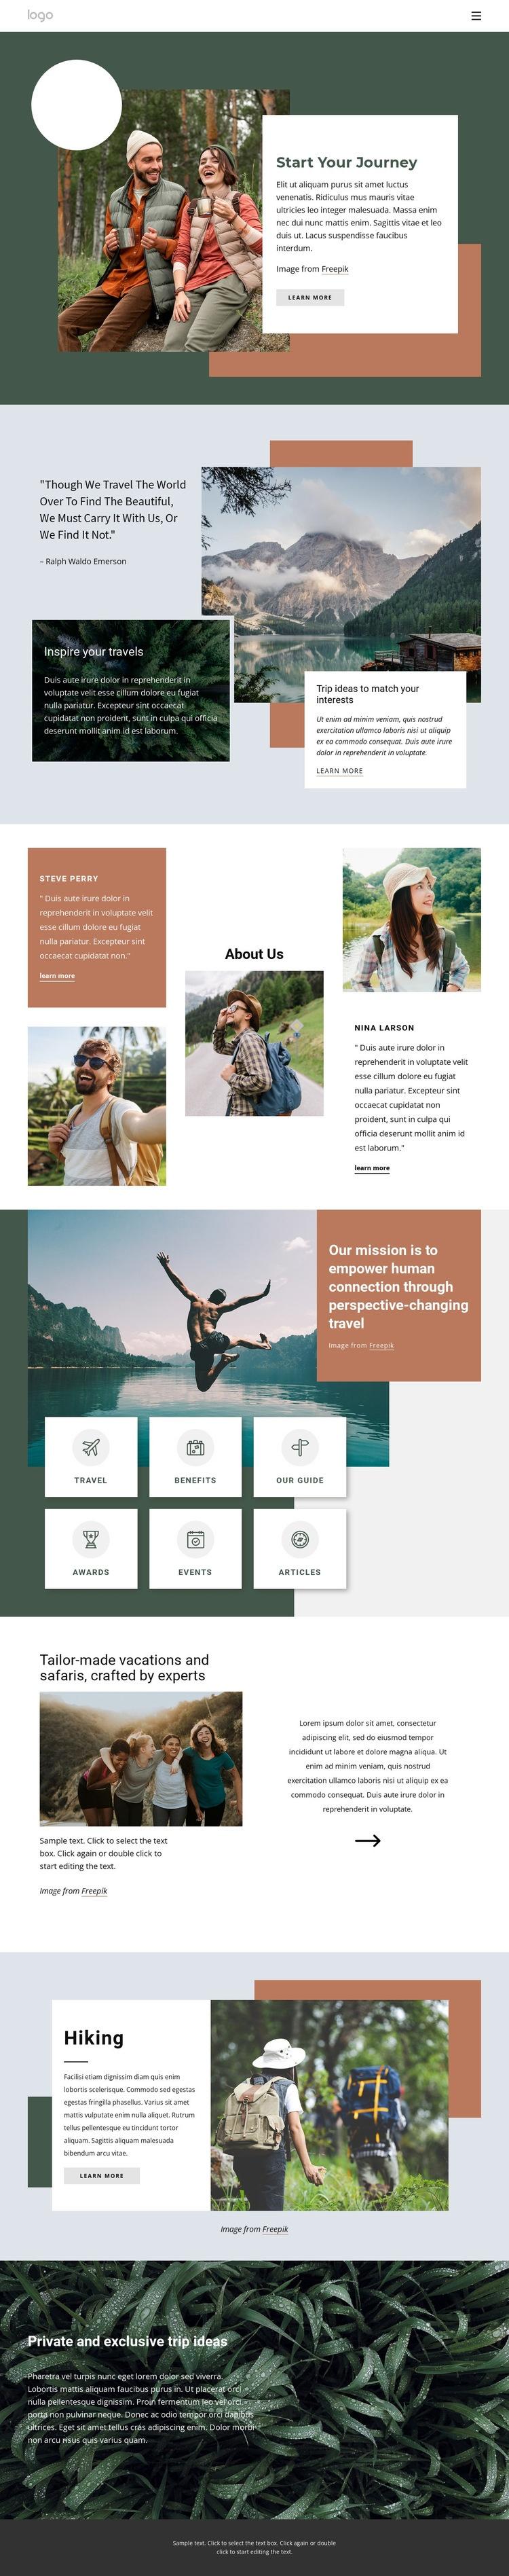 Adventure travel company Web Page Design